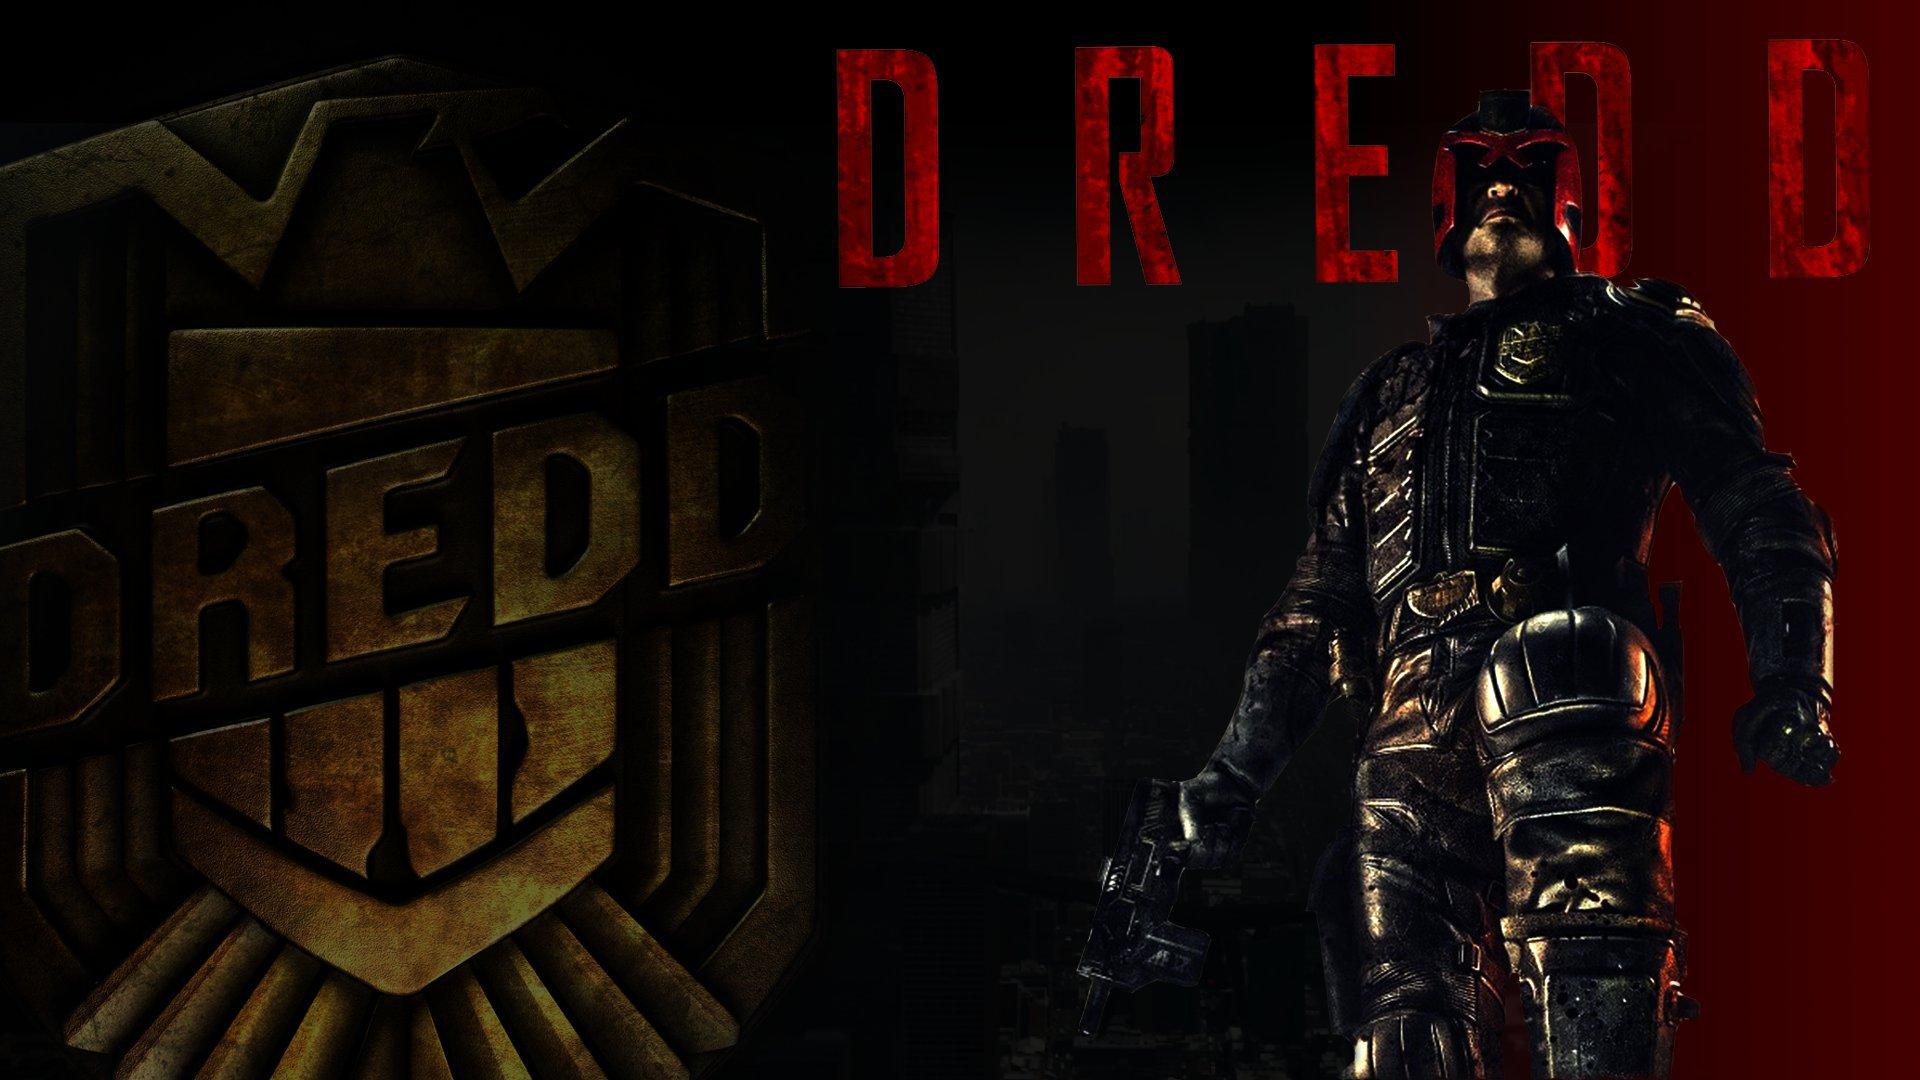 Judge Dredd Wallpapers